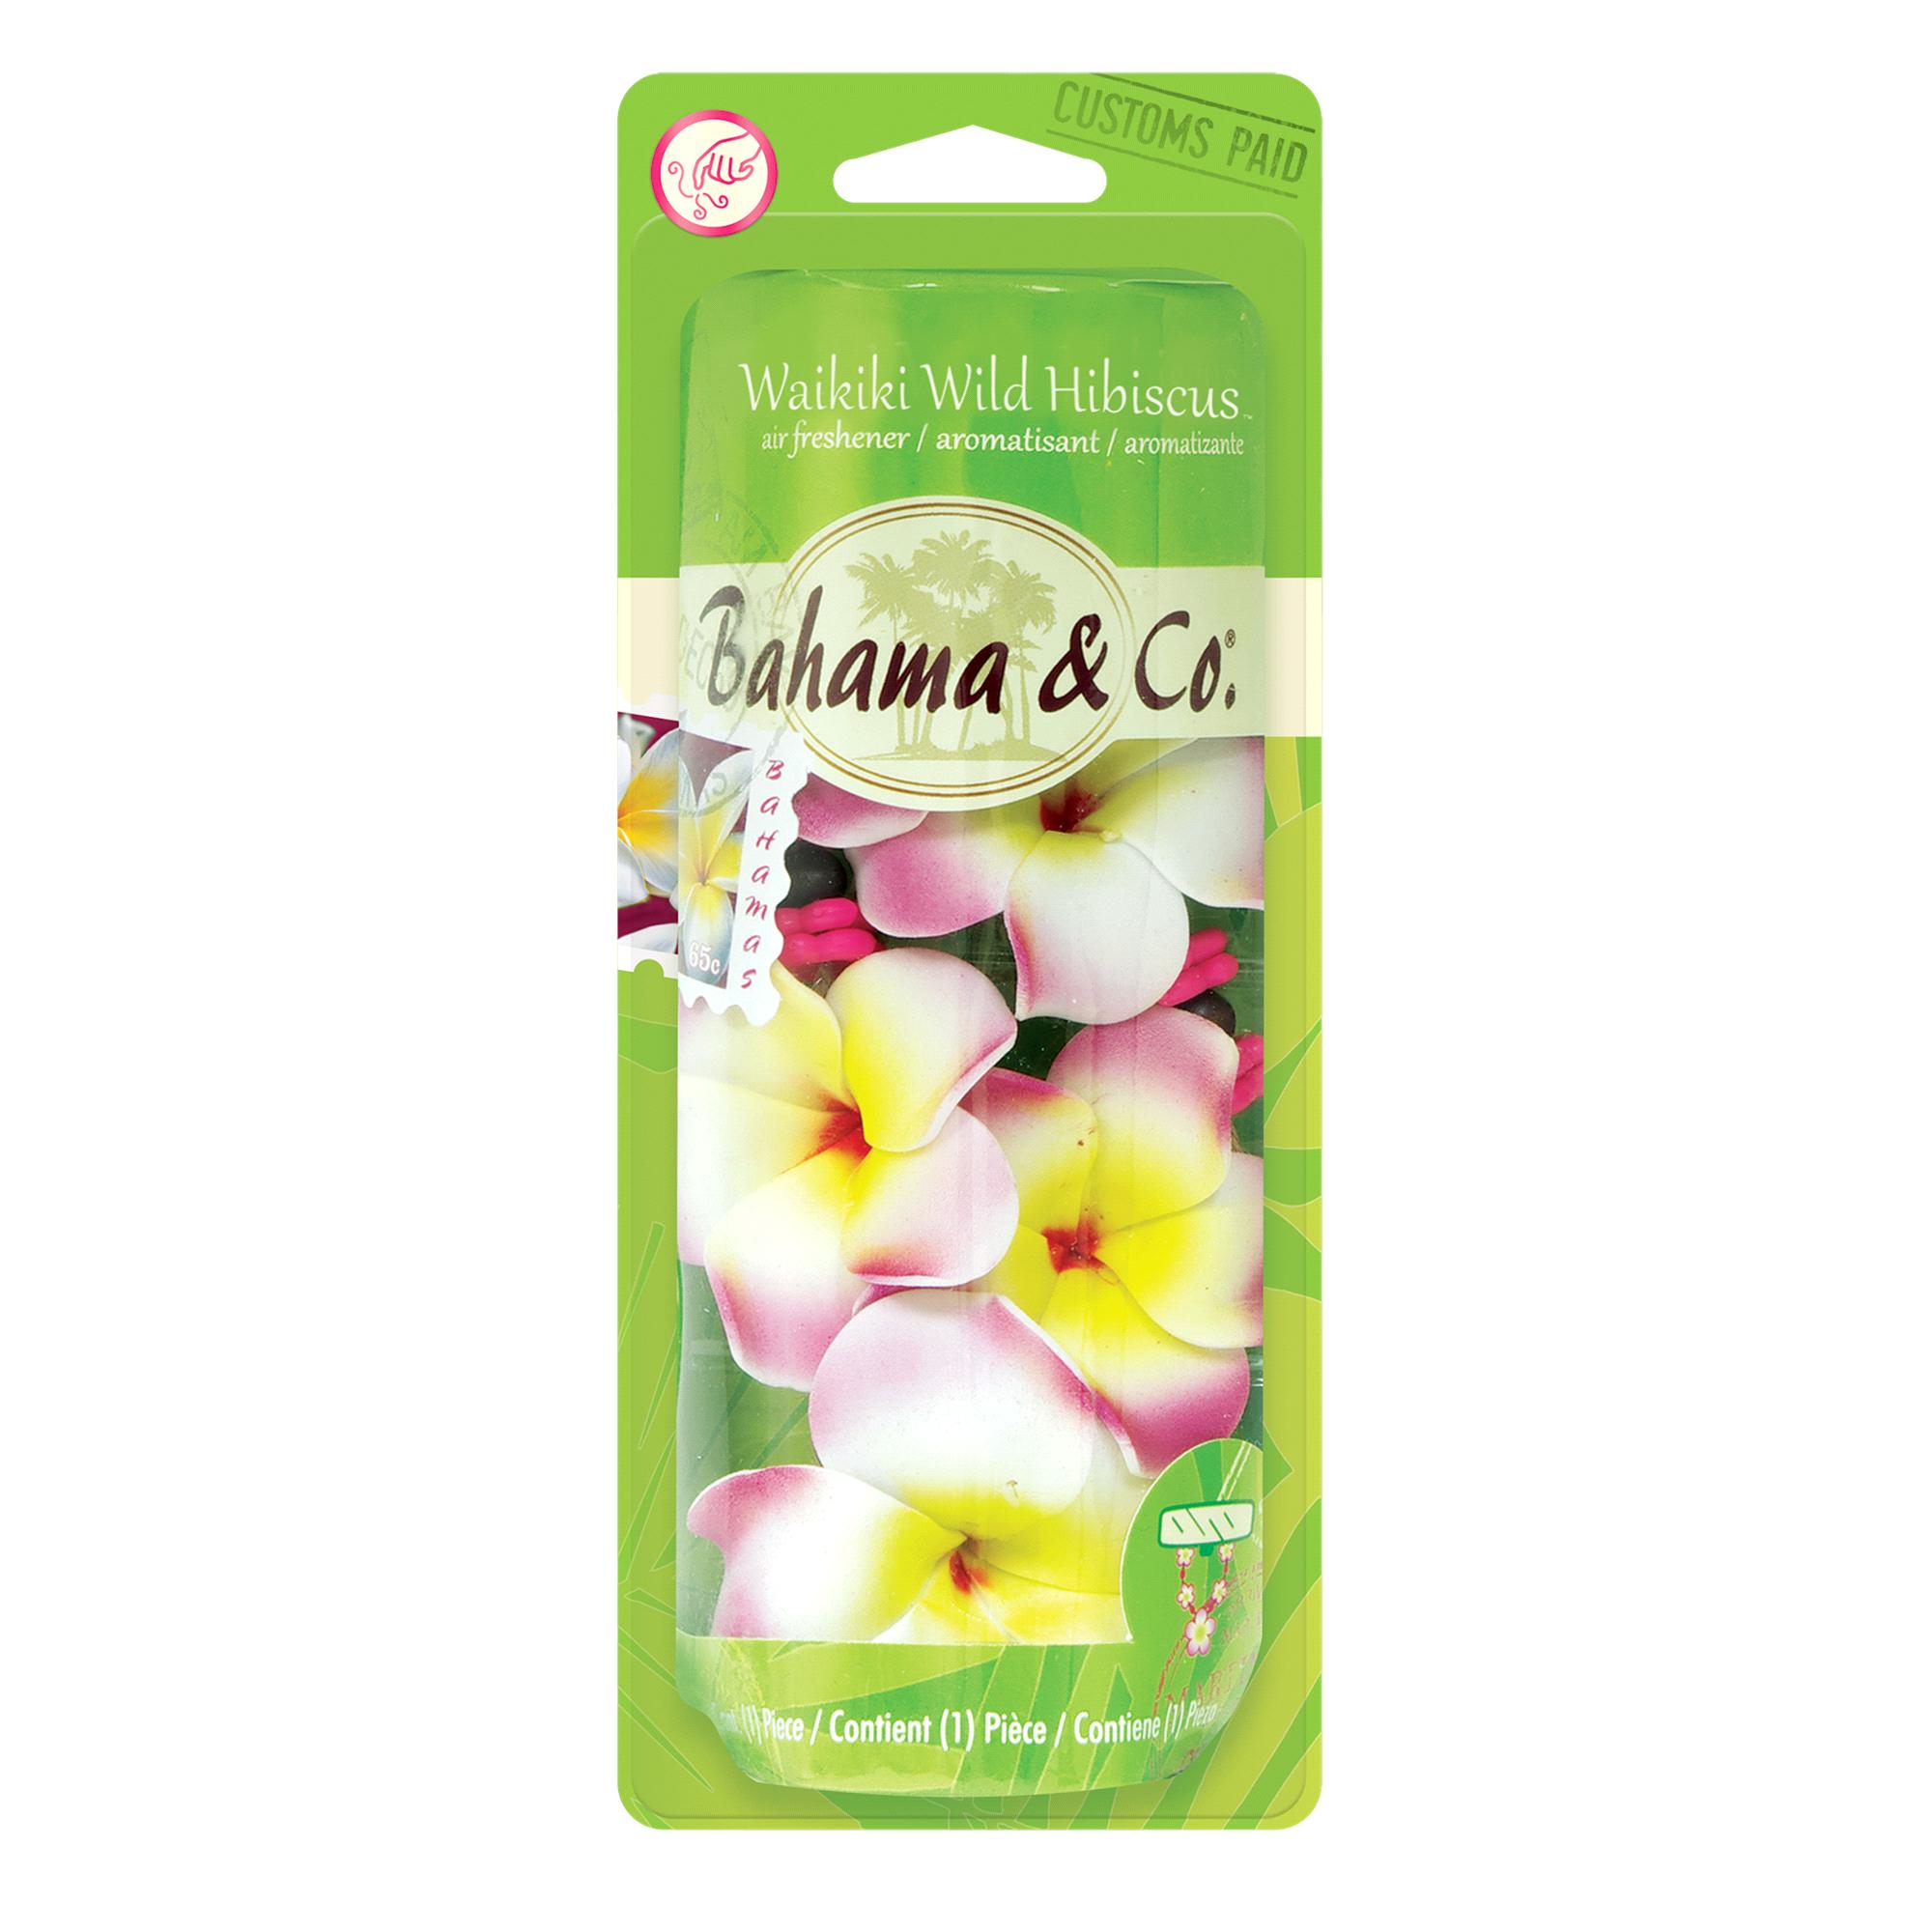 Bahama Co Necklace Waikiki Wild Hibiscus Meijer